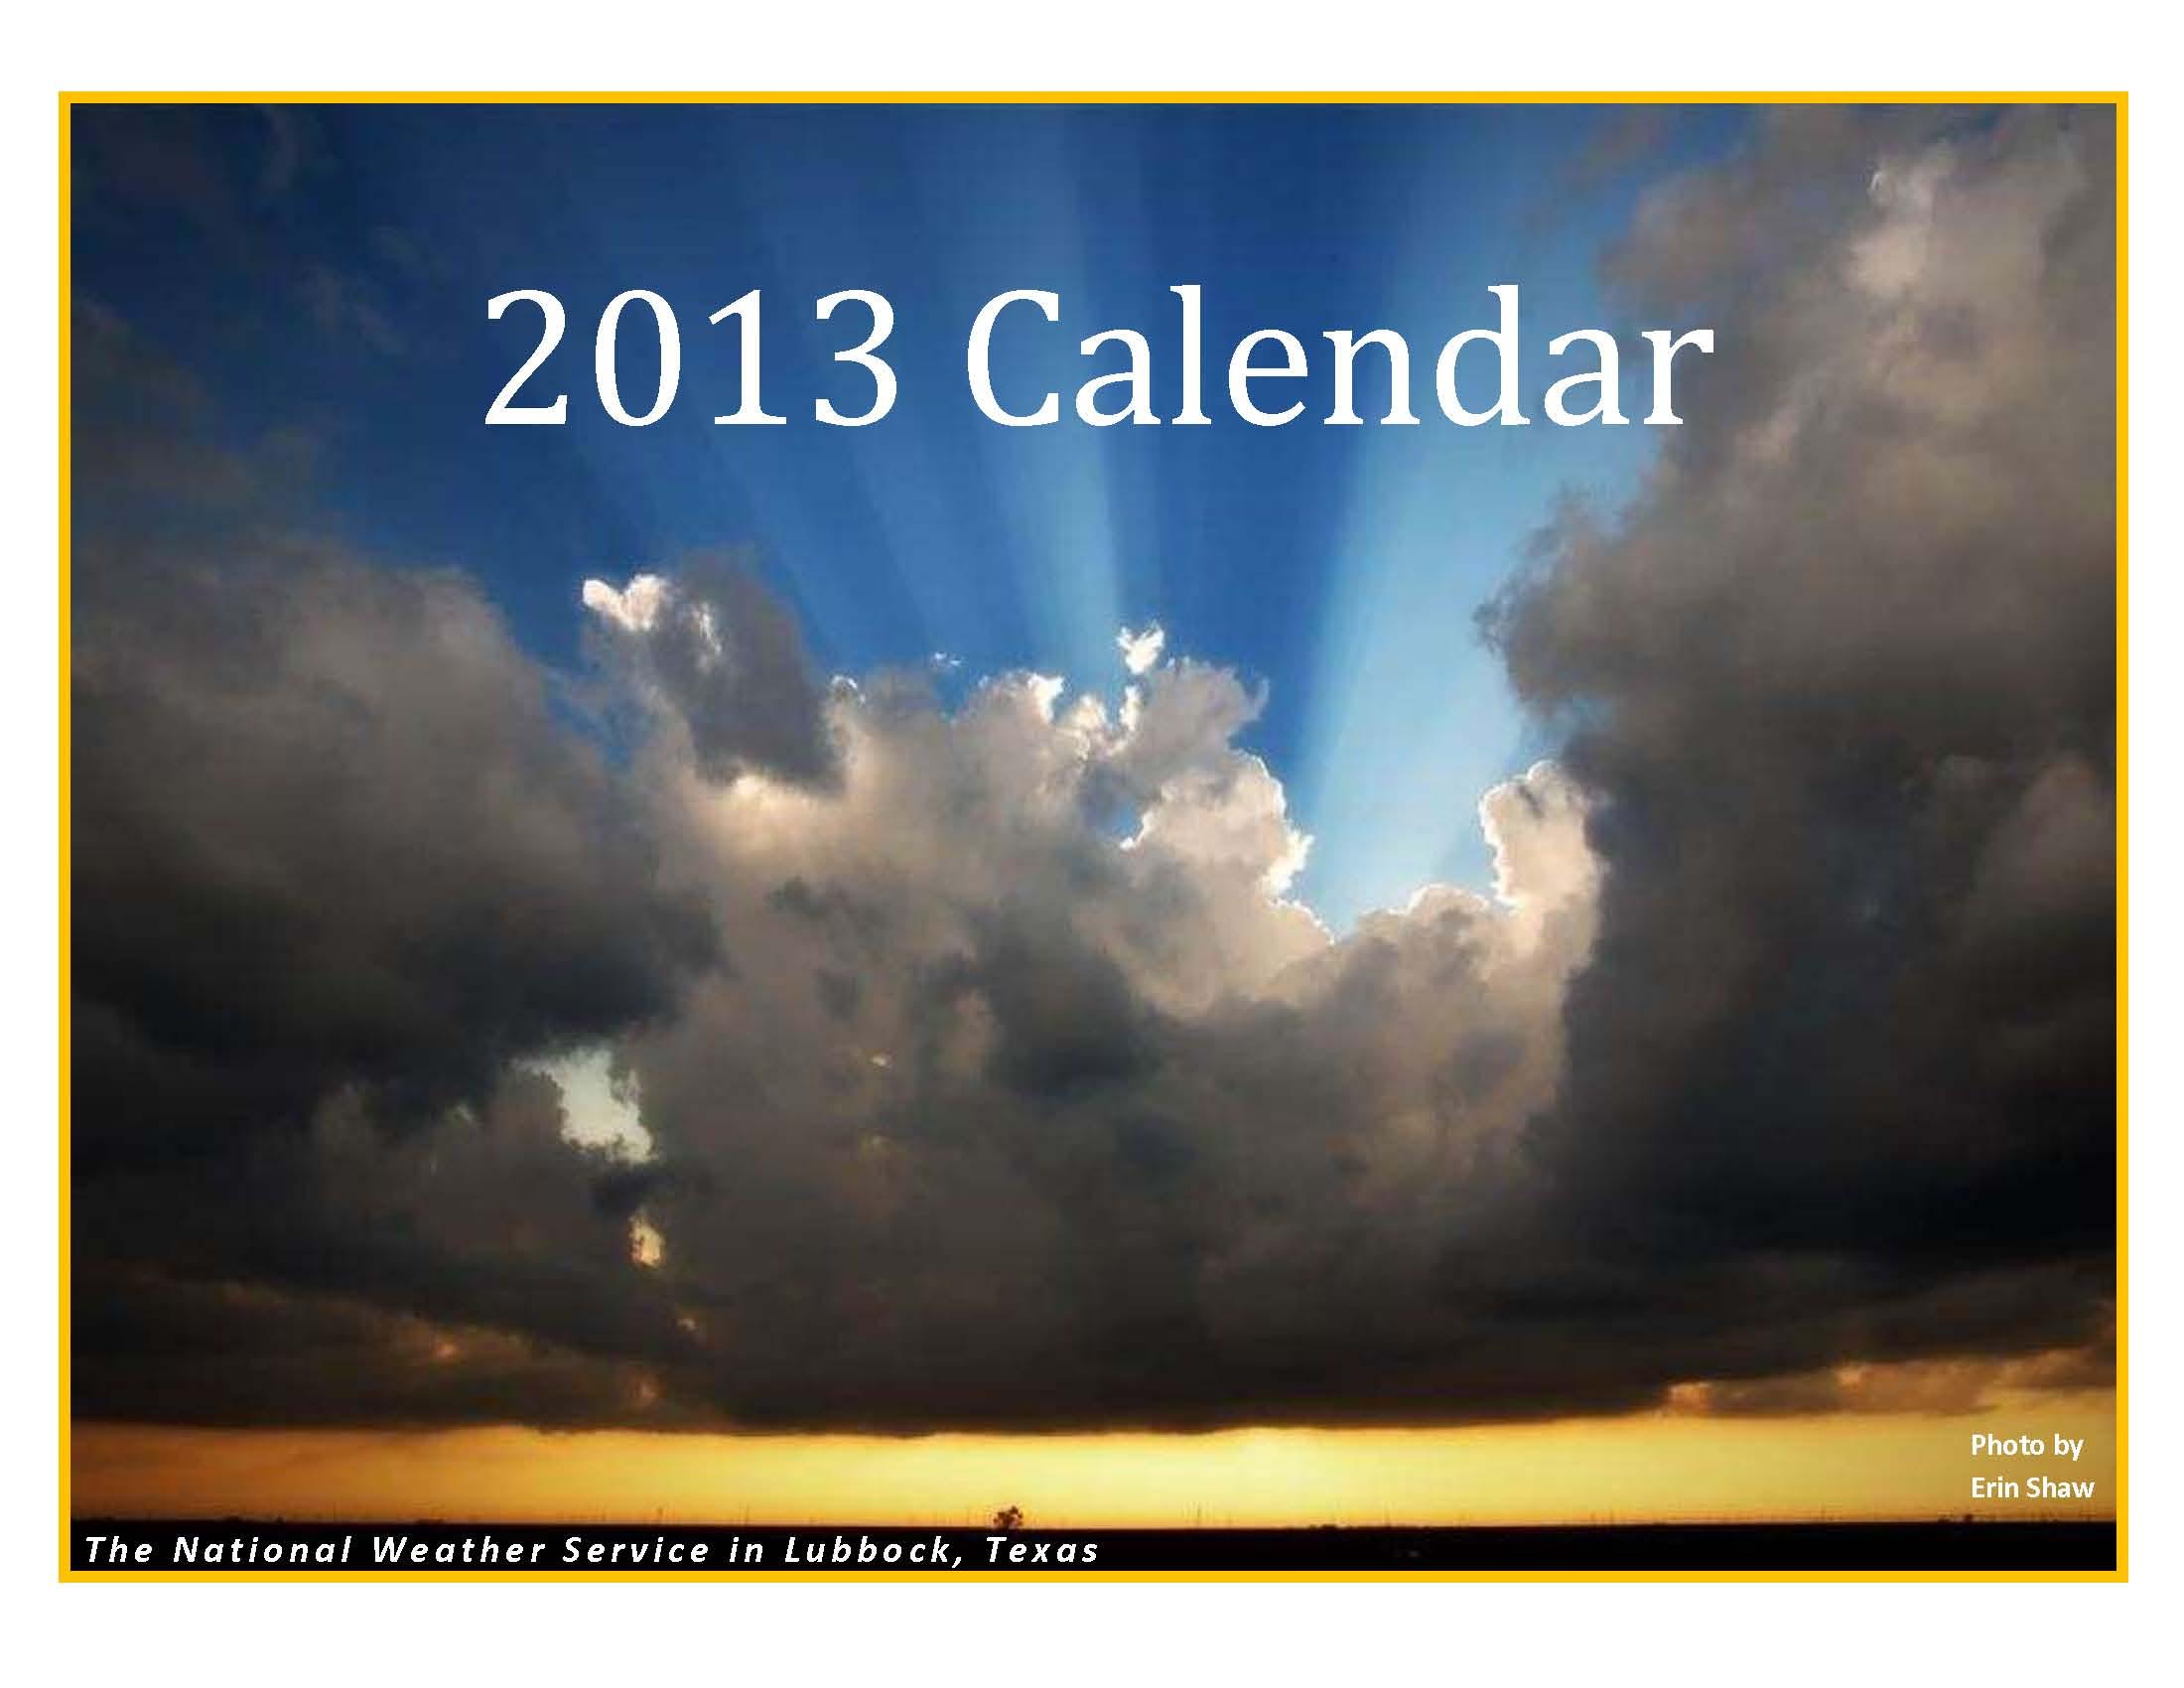 2013 NWS Lubbock Calendar